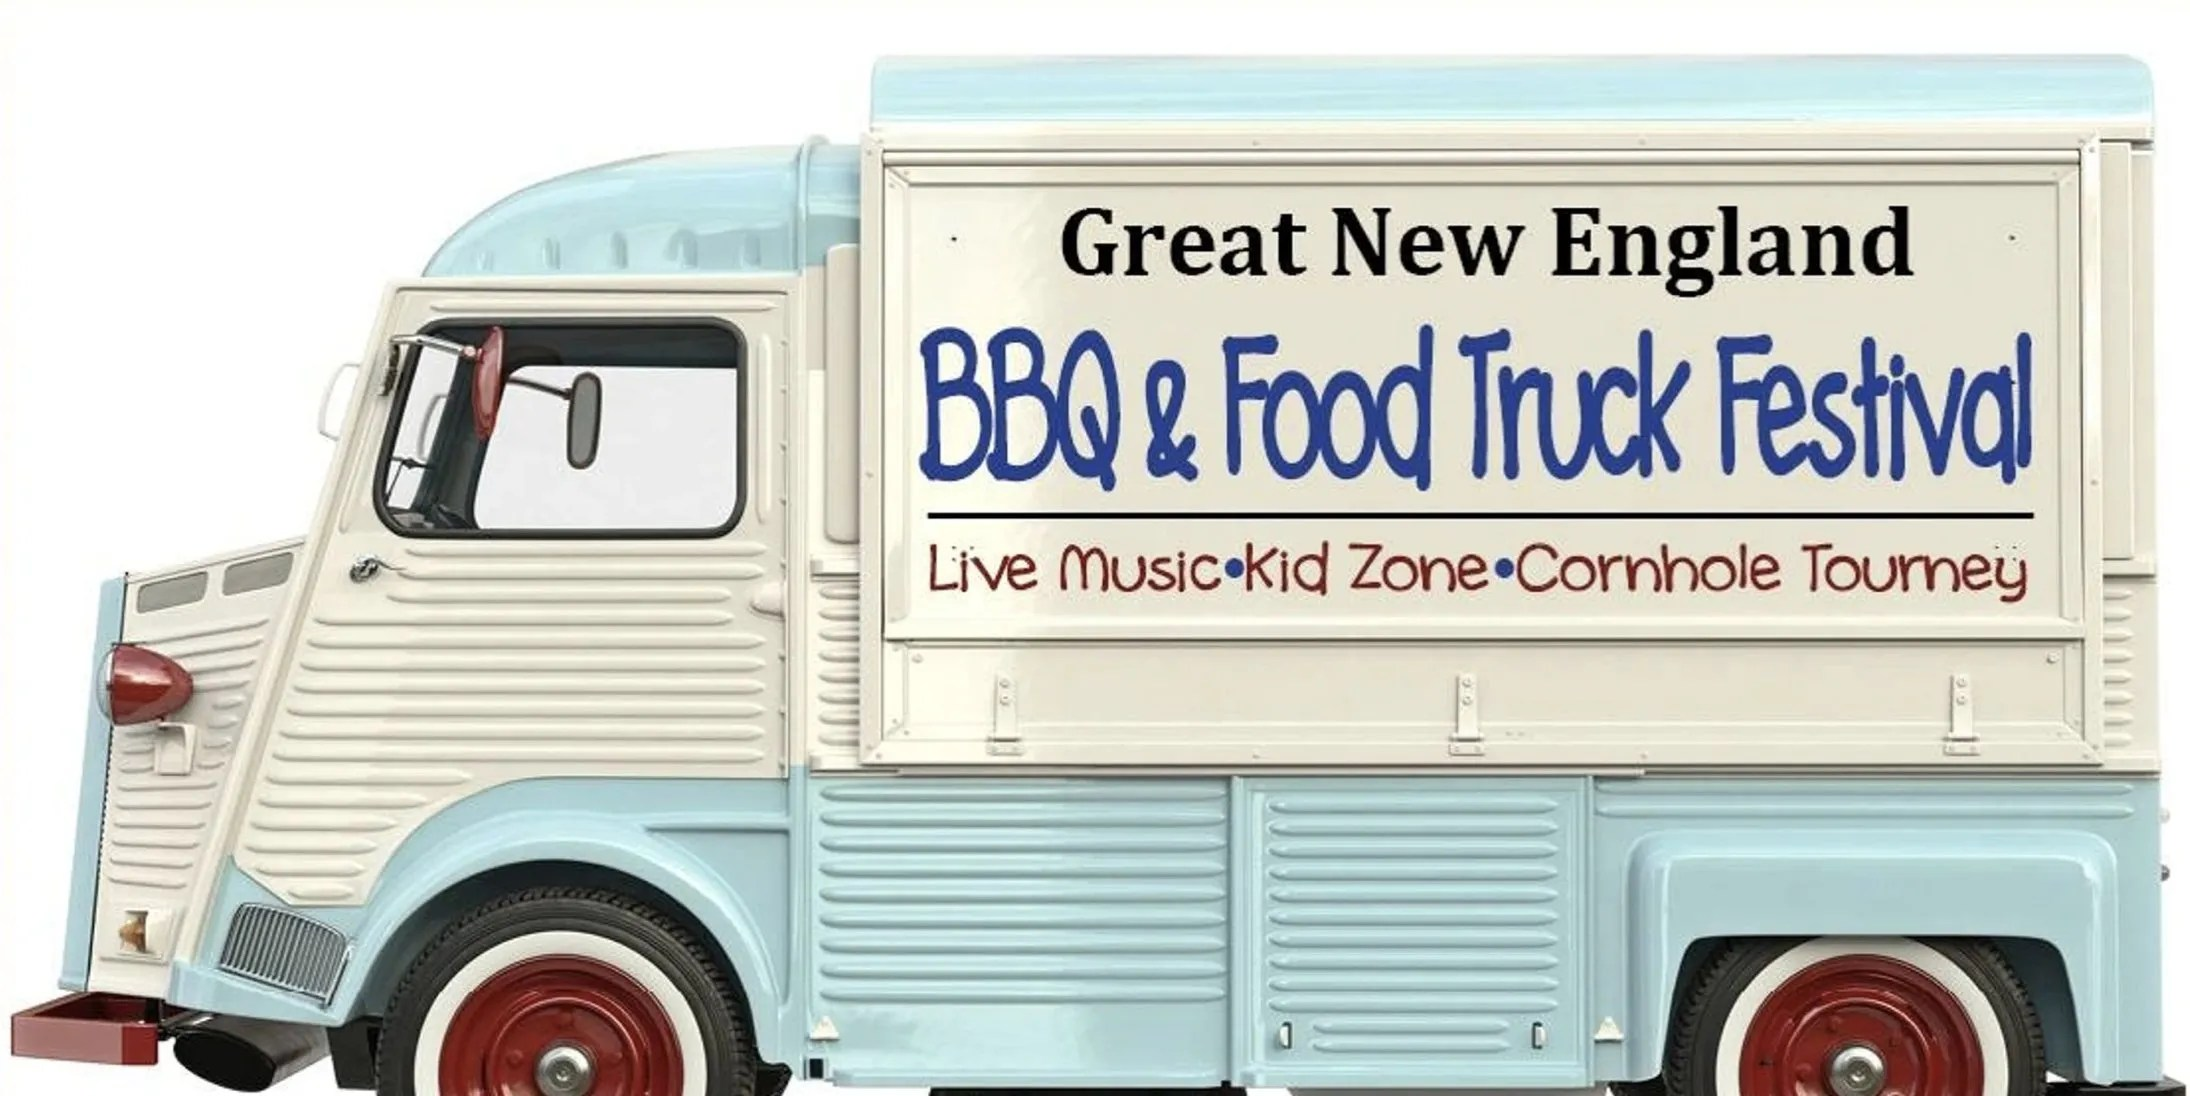 GNE Food Truck Festival